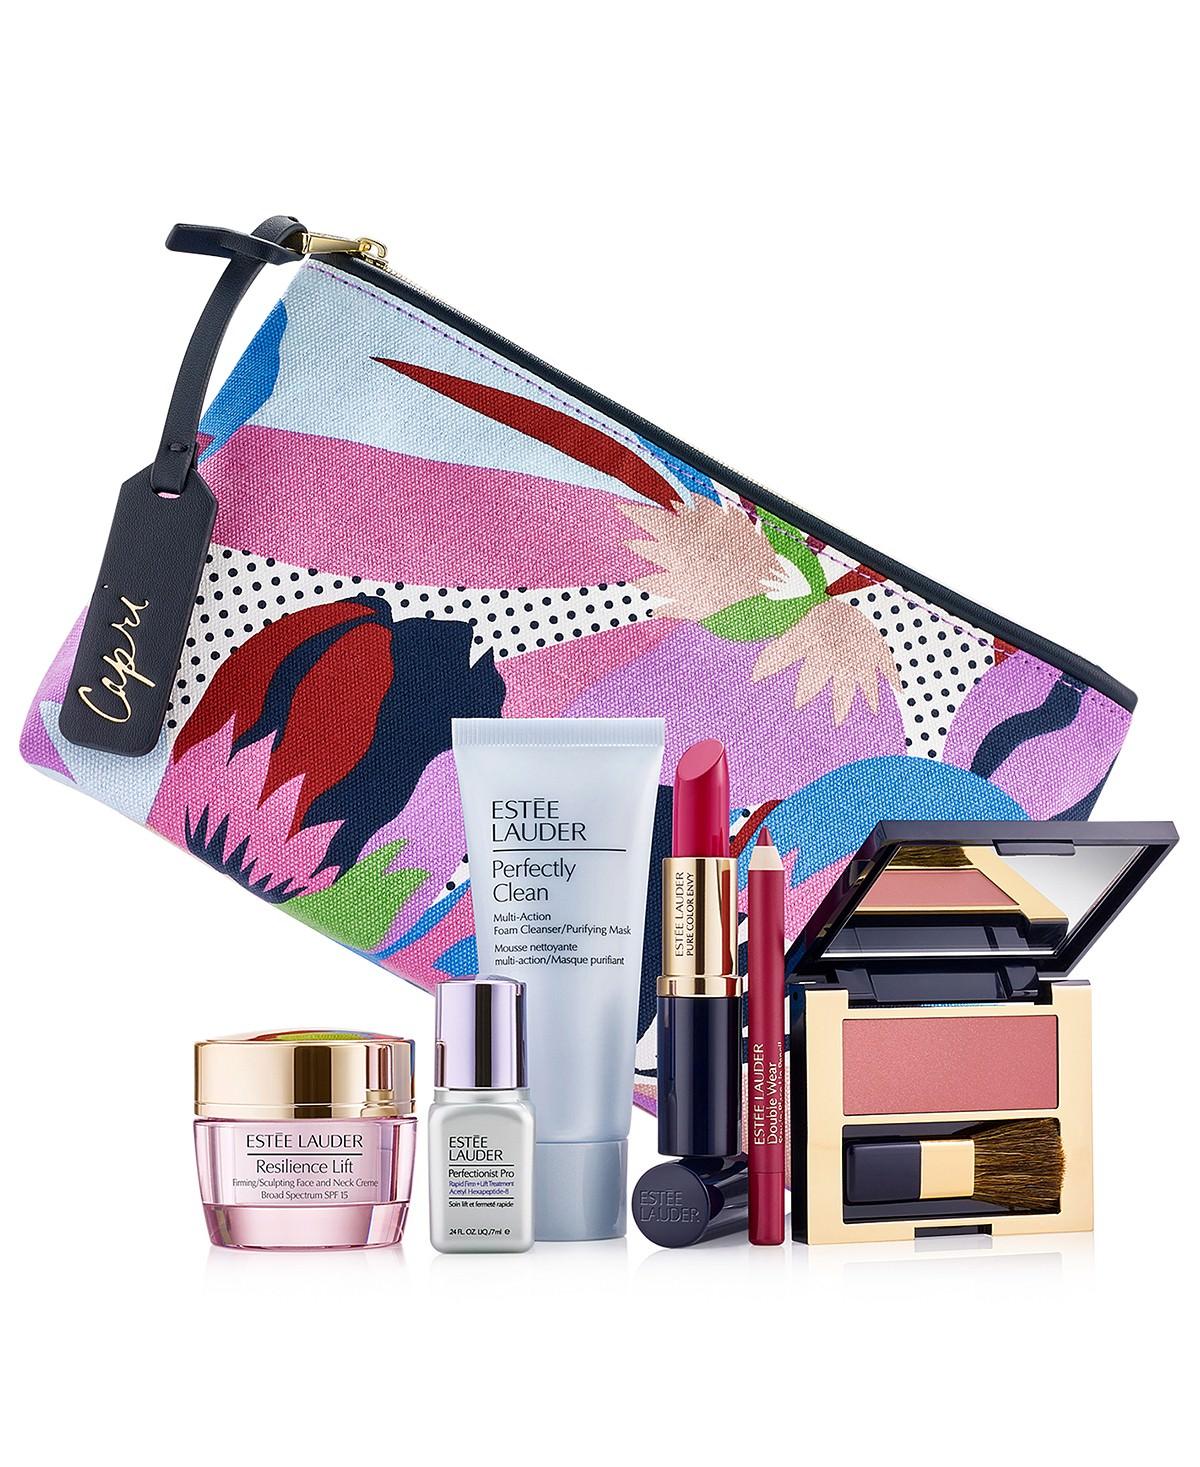 41e792c7d Macy's: 15% Off Beauty: $37.50 Estee Lauder Item + 7-Pc Gift Set $32.30 &  More + Free Shipping